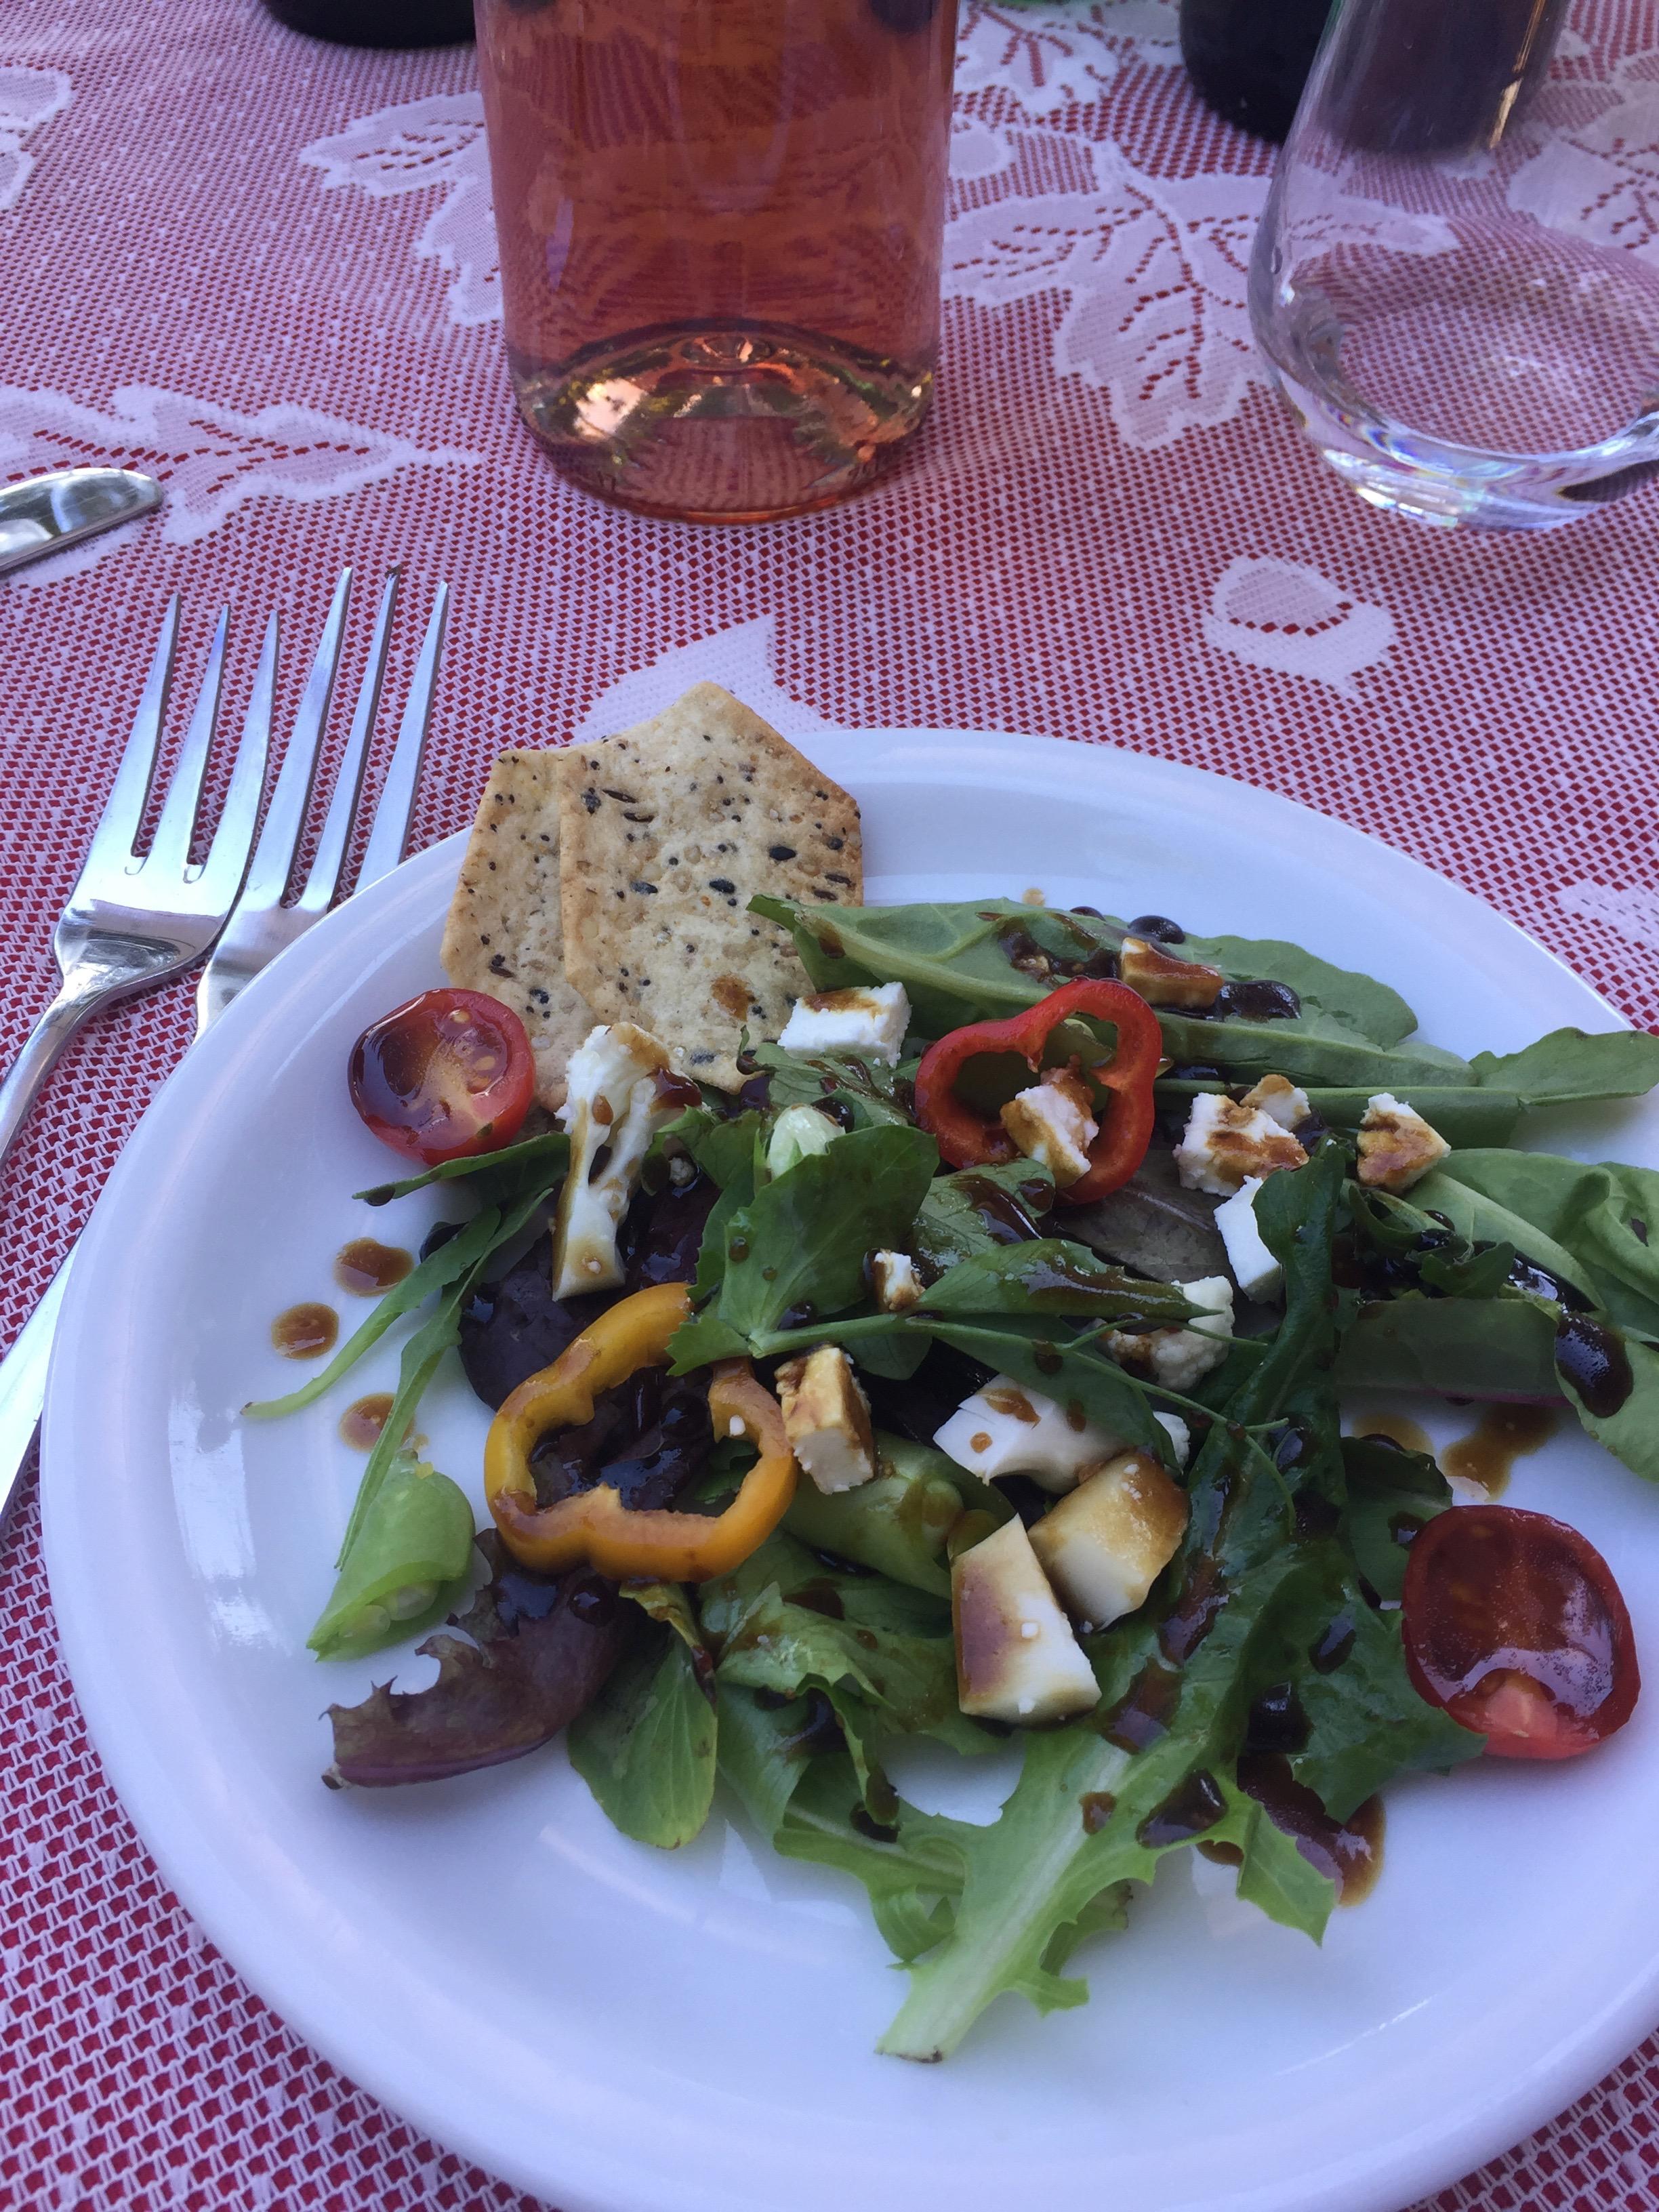 Copy of Salad with Pedroni Balsamico and SA Olive oil